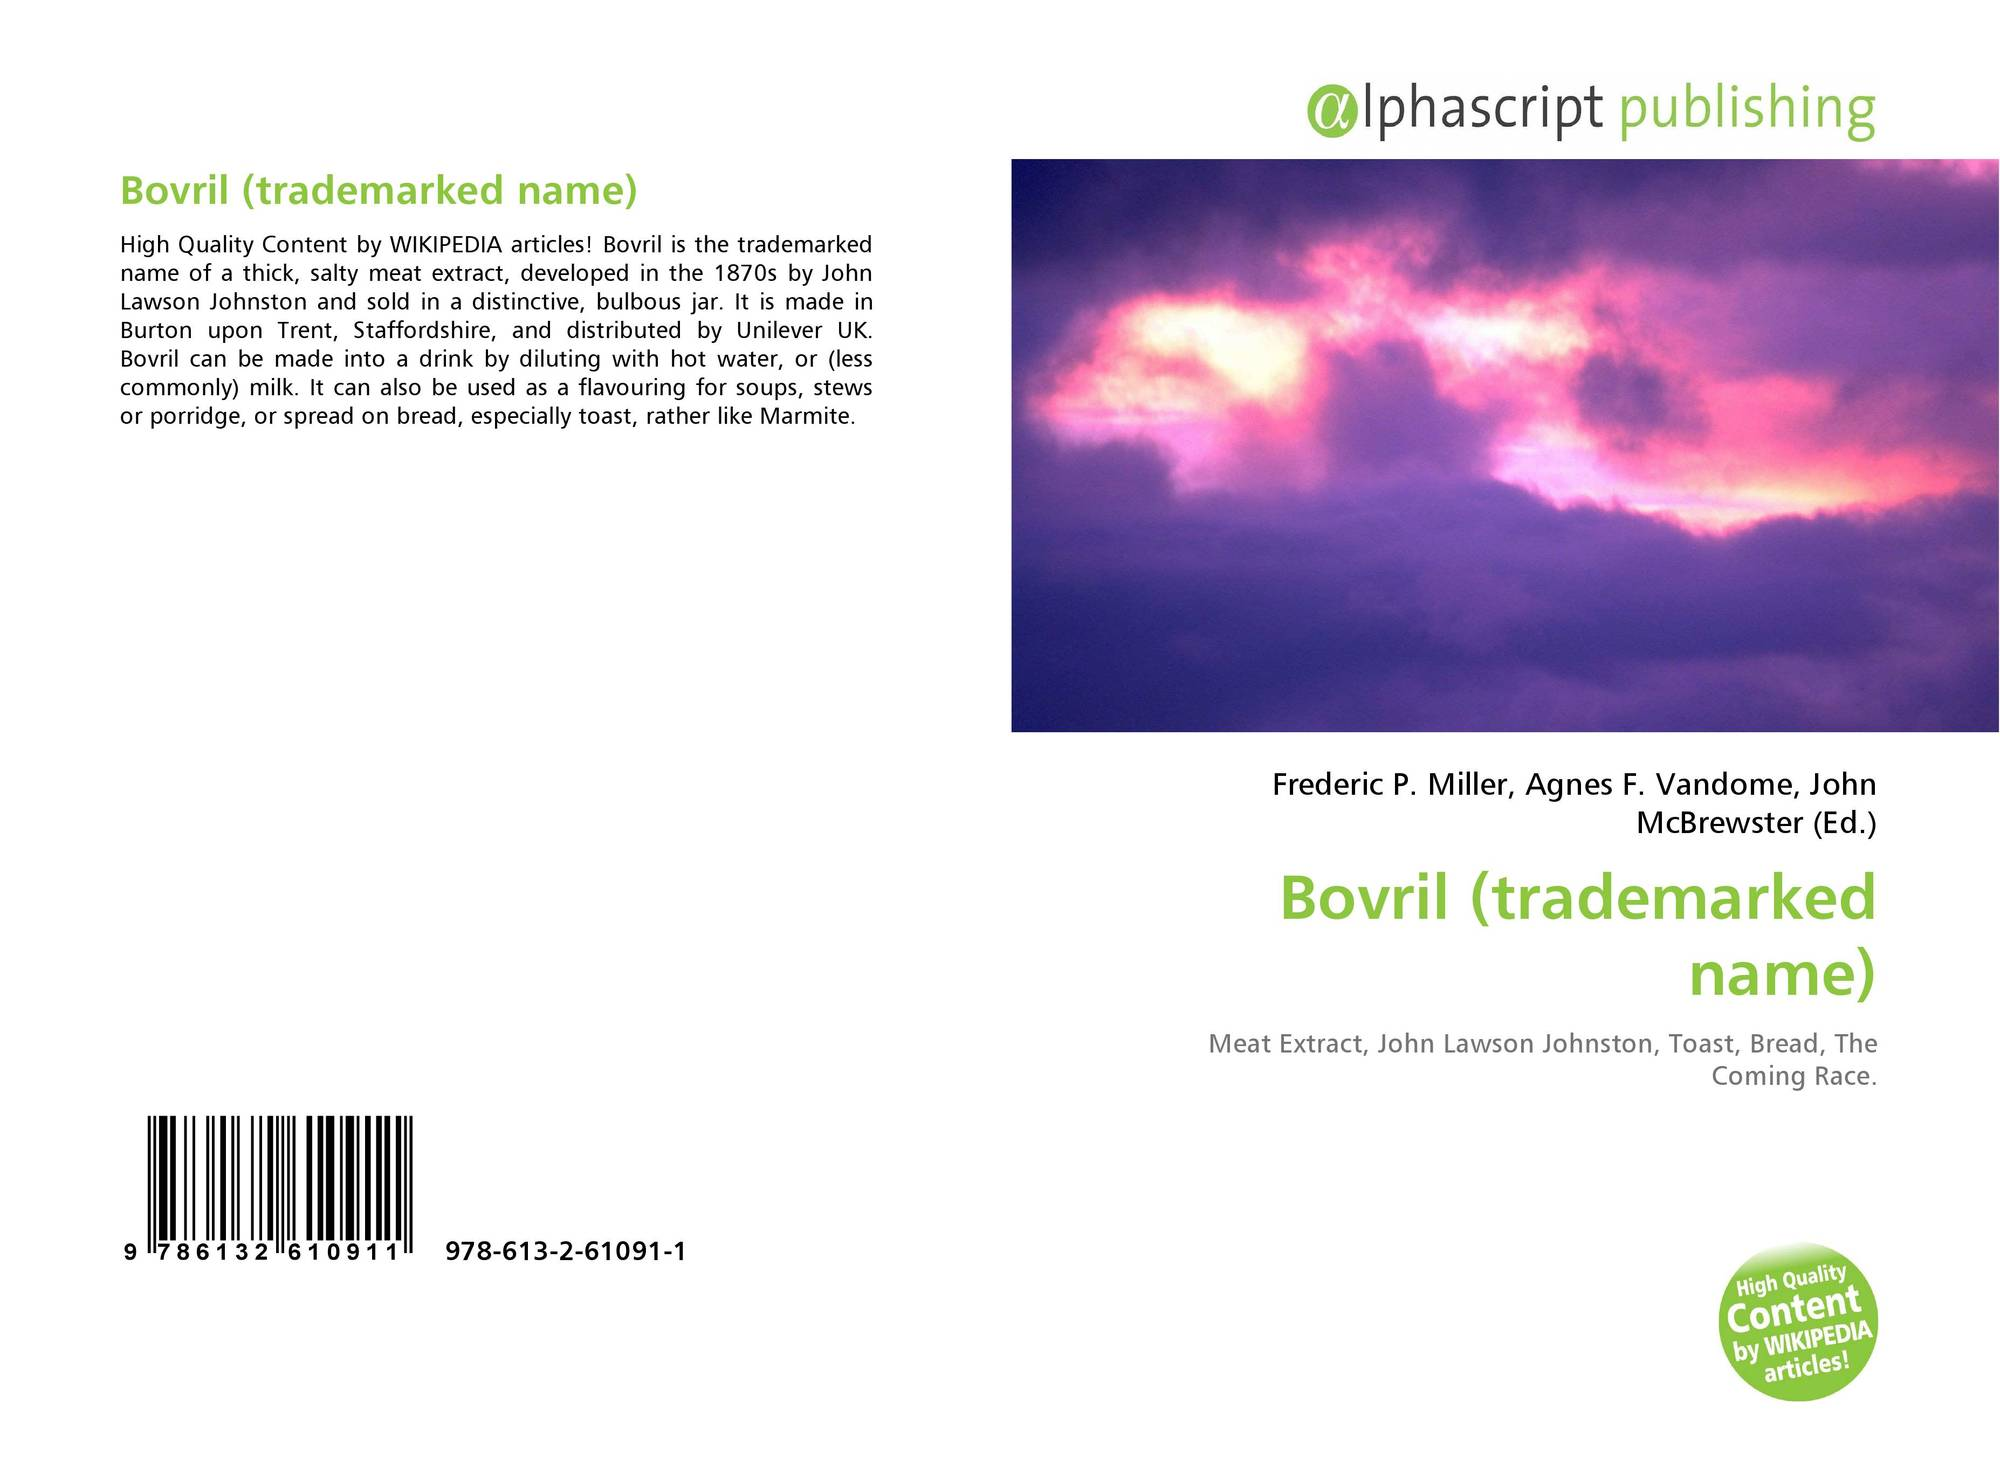 Bovril (trademarked name), 978-613-2